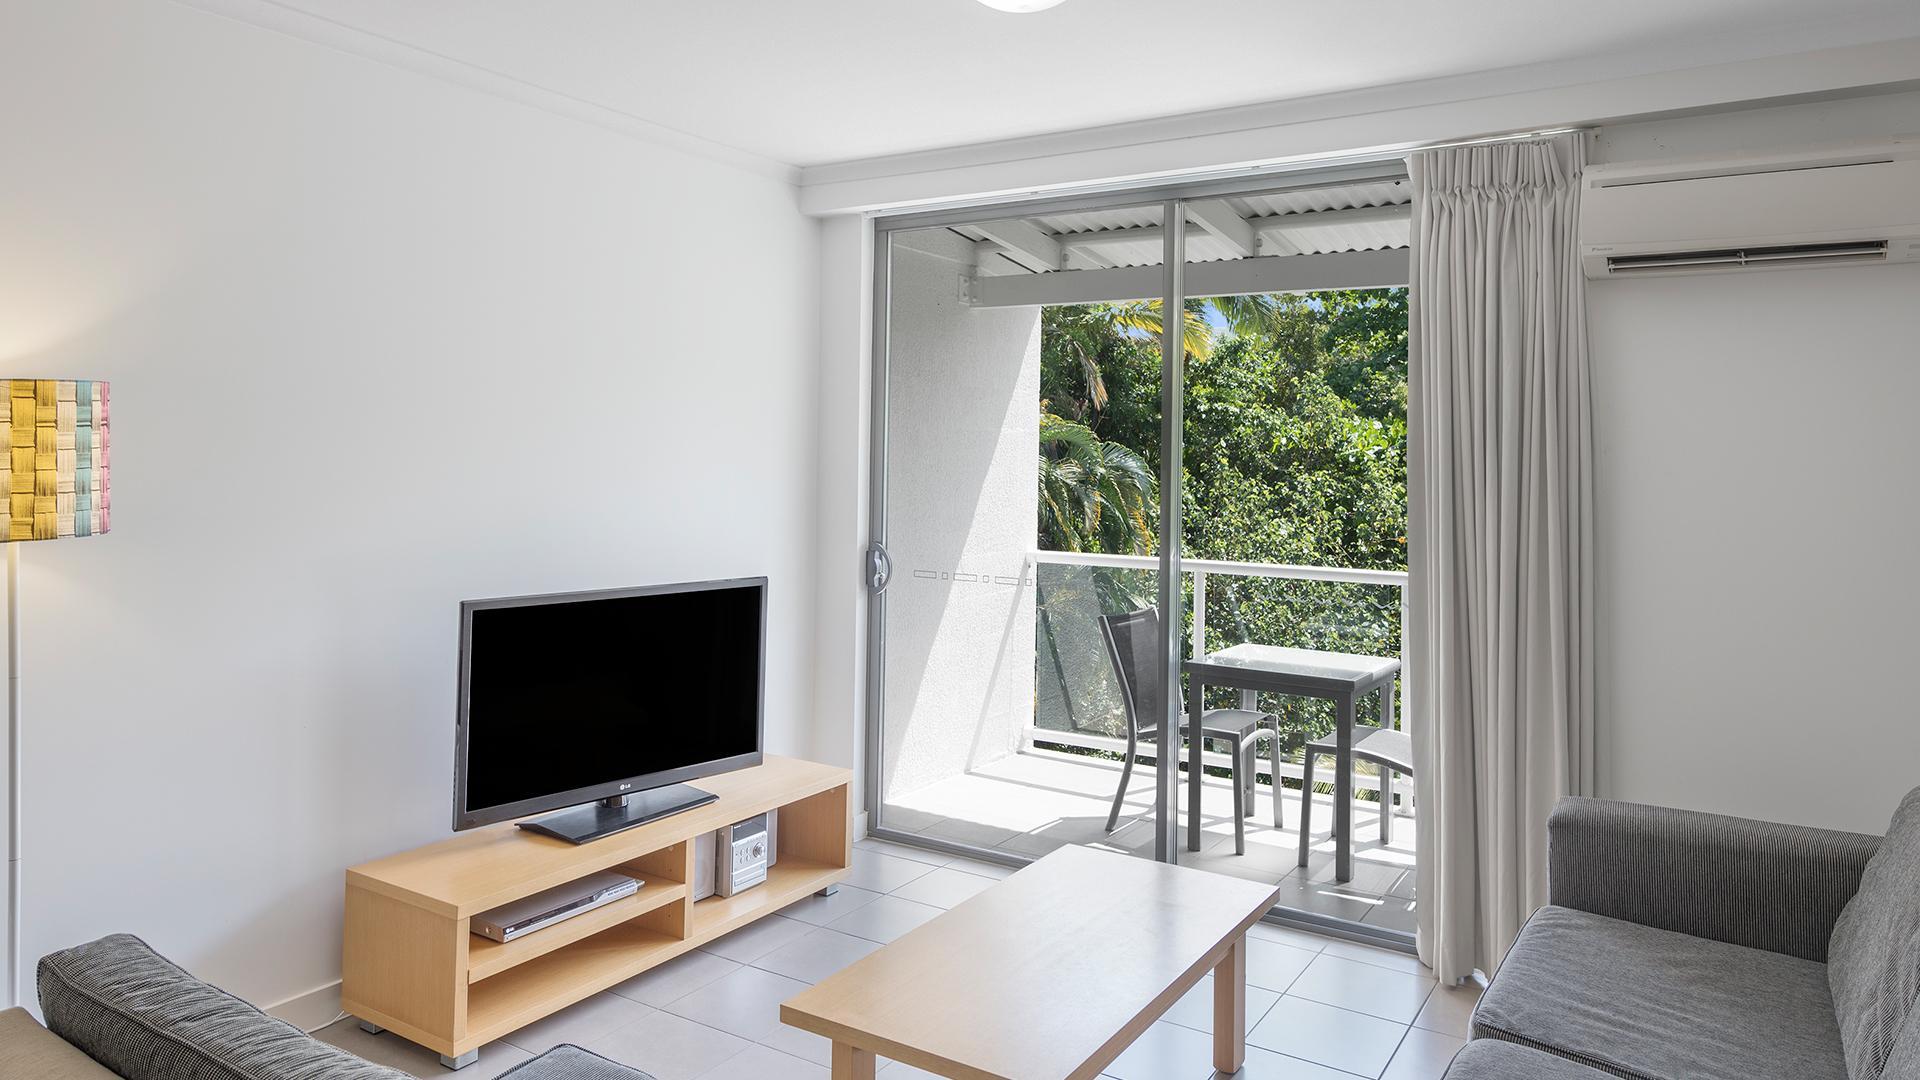 One-Bedroom Garden View Apartment image 1 at Oaks Port Douglas Resort Feb 2021 by Douglas Shire, Queensland, Australia